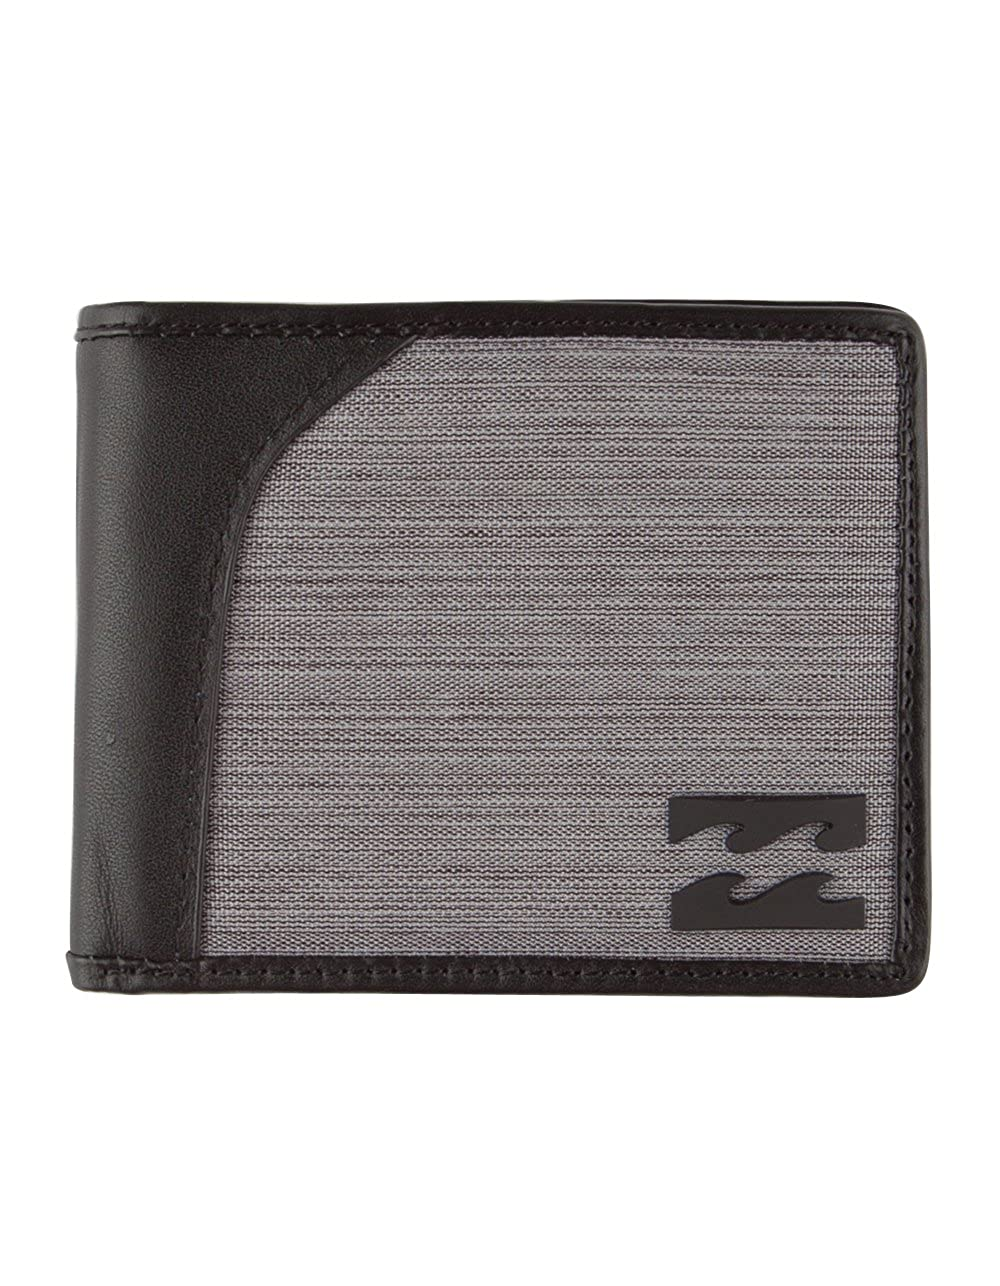 BILLABONG Dominator Wallet Black 29219710001